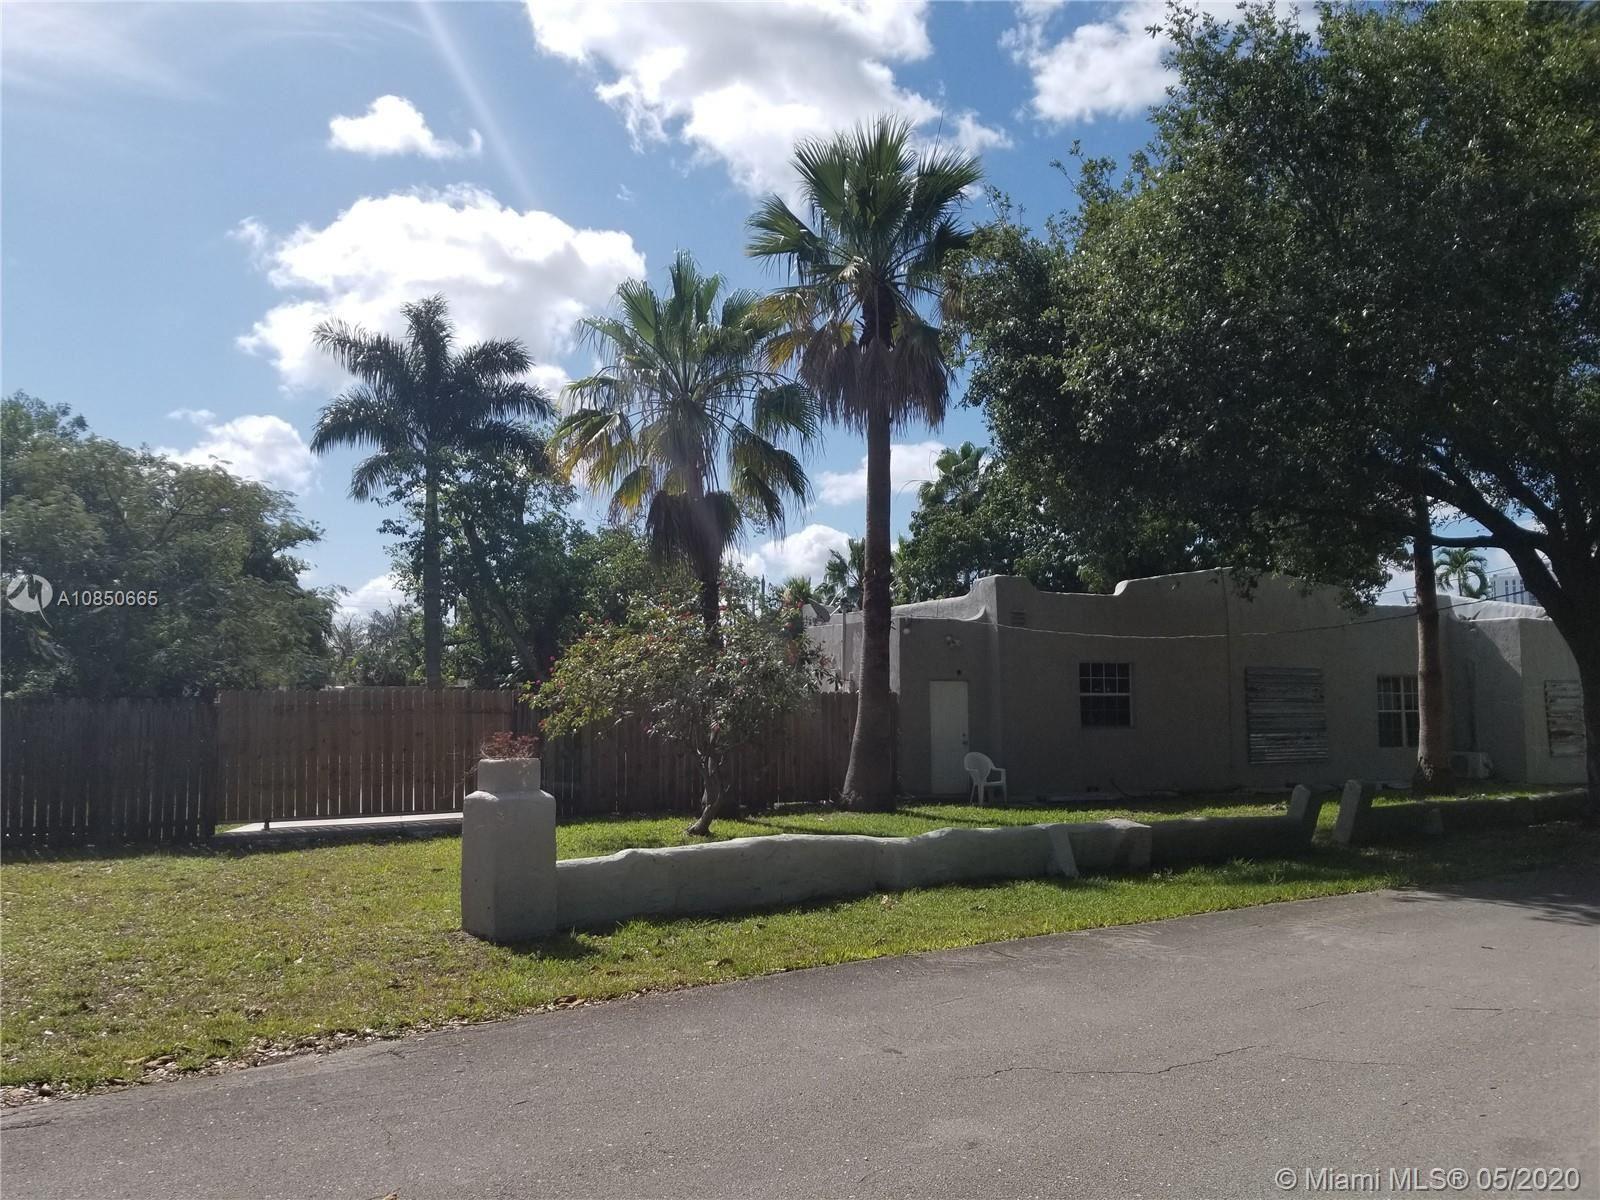 2501 NE 181st St, North Miami Beach, FL 33160 - #: A10850665